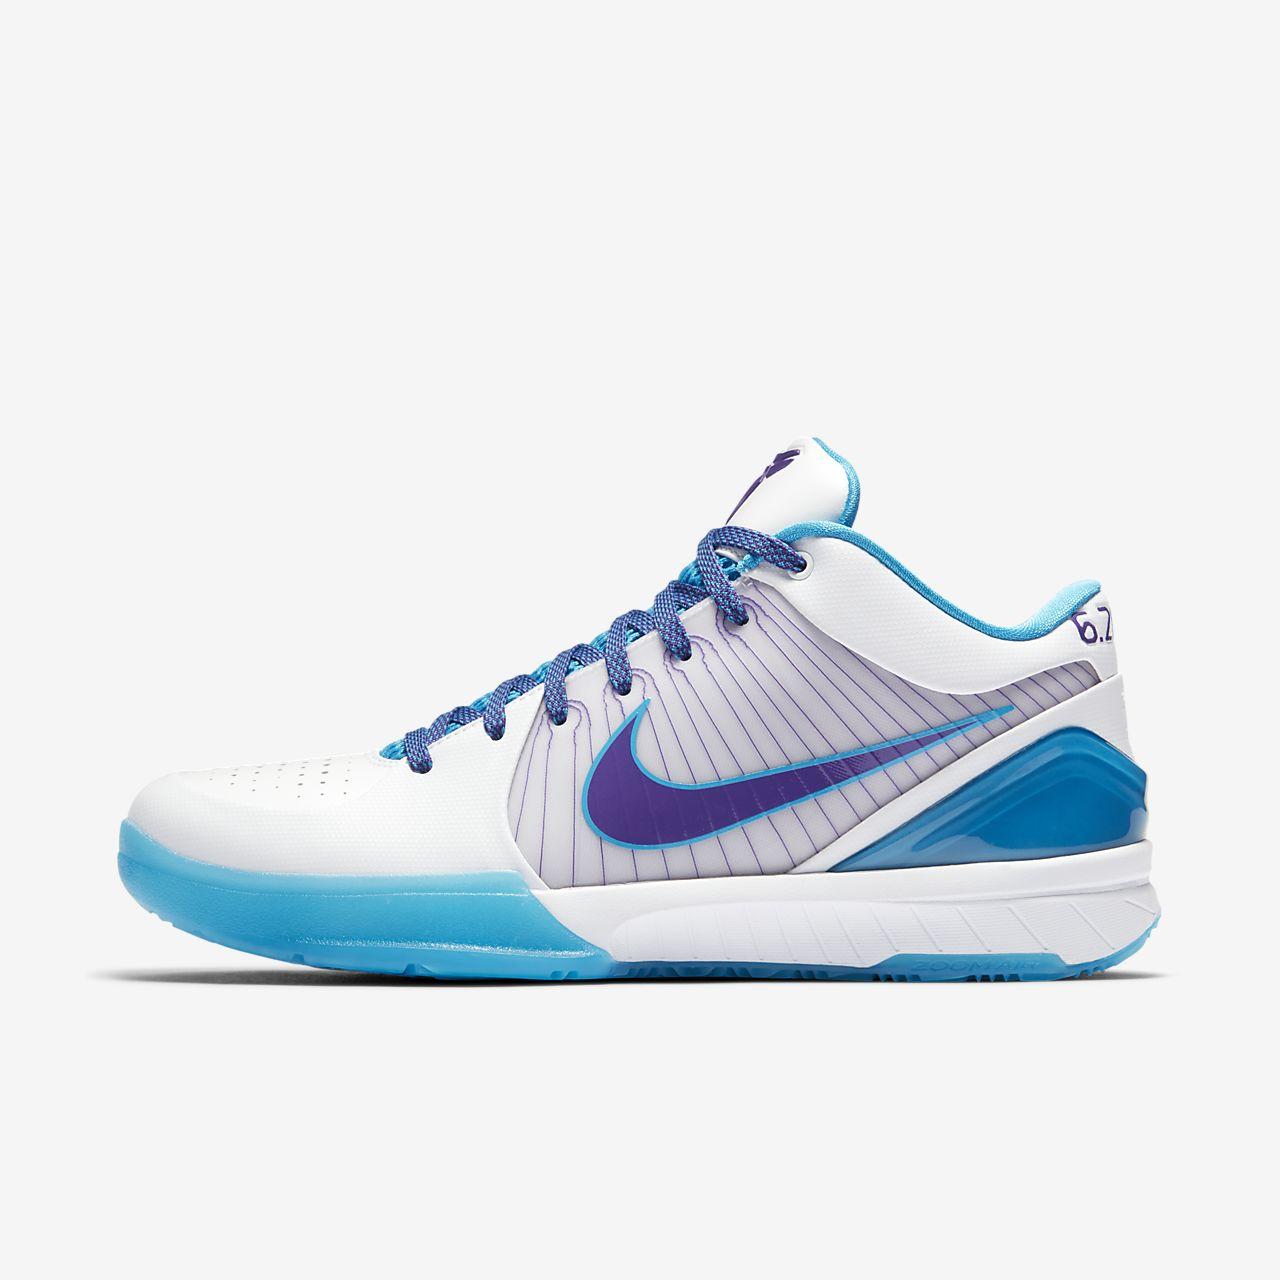 391500d3099e Kobe IV Protro Basketball Shoe. Nike.com